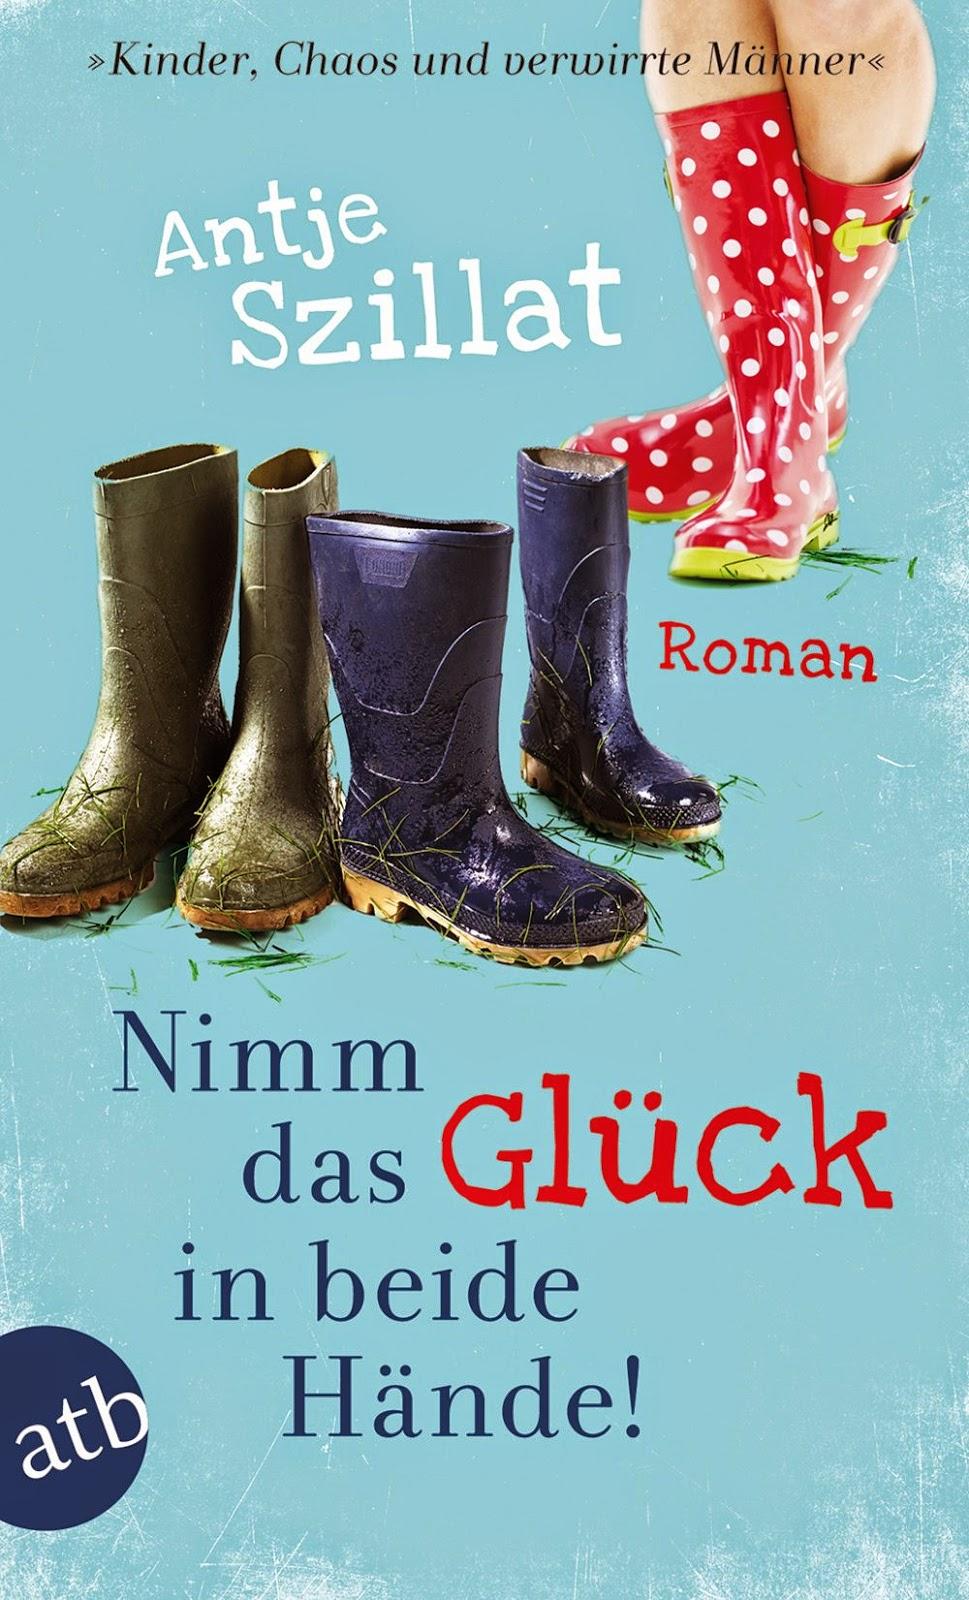 http://www.amazon.de/Nimm-das-Gl%C3%BCck-beide-H%C3%A4nde/dp/374663055X/ref=sr_1_1?s=books&ie=UTF8&qid=1421221991&sr=1-1&keywords=nimm+das+gl%C3%BCck+in+beide+h%C3%A4nde